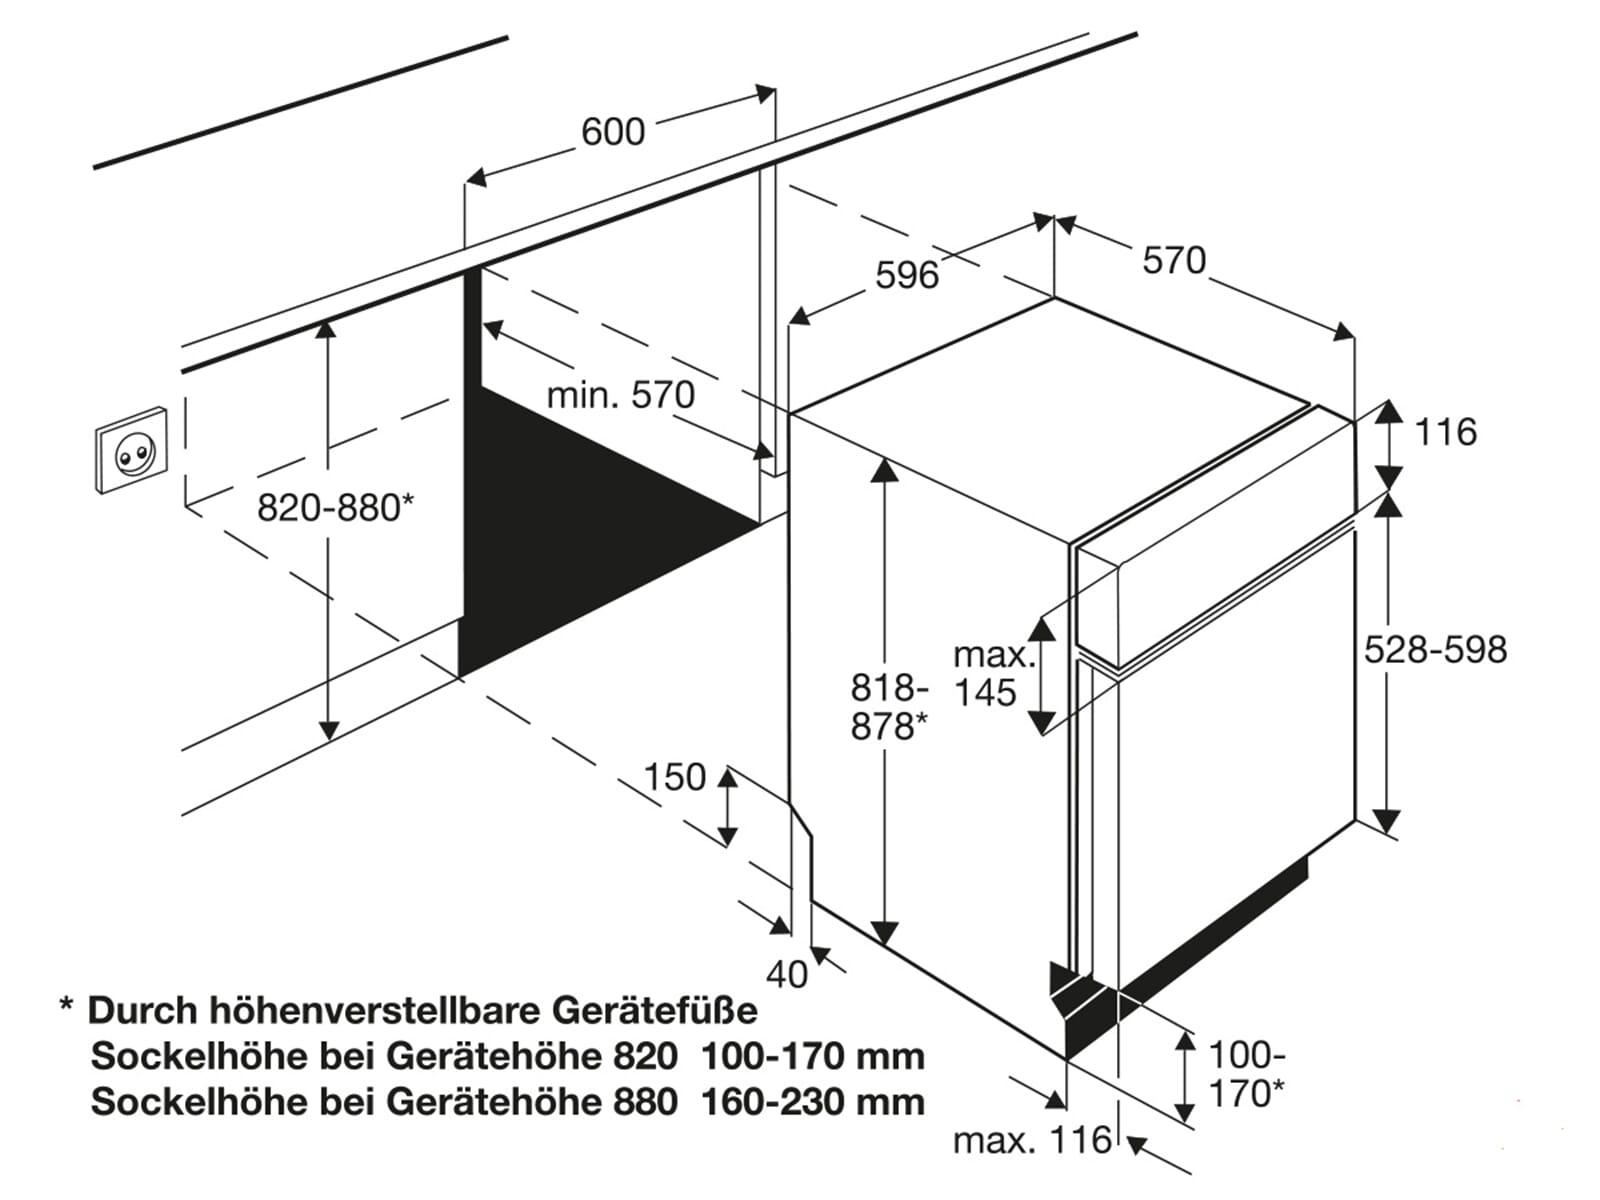 aeg f34500im0 teilintegrierbarer einbau geschirrsp ler f r 428 90 eur. Black Bedroom Furniture Sets. Home Design Ideas